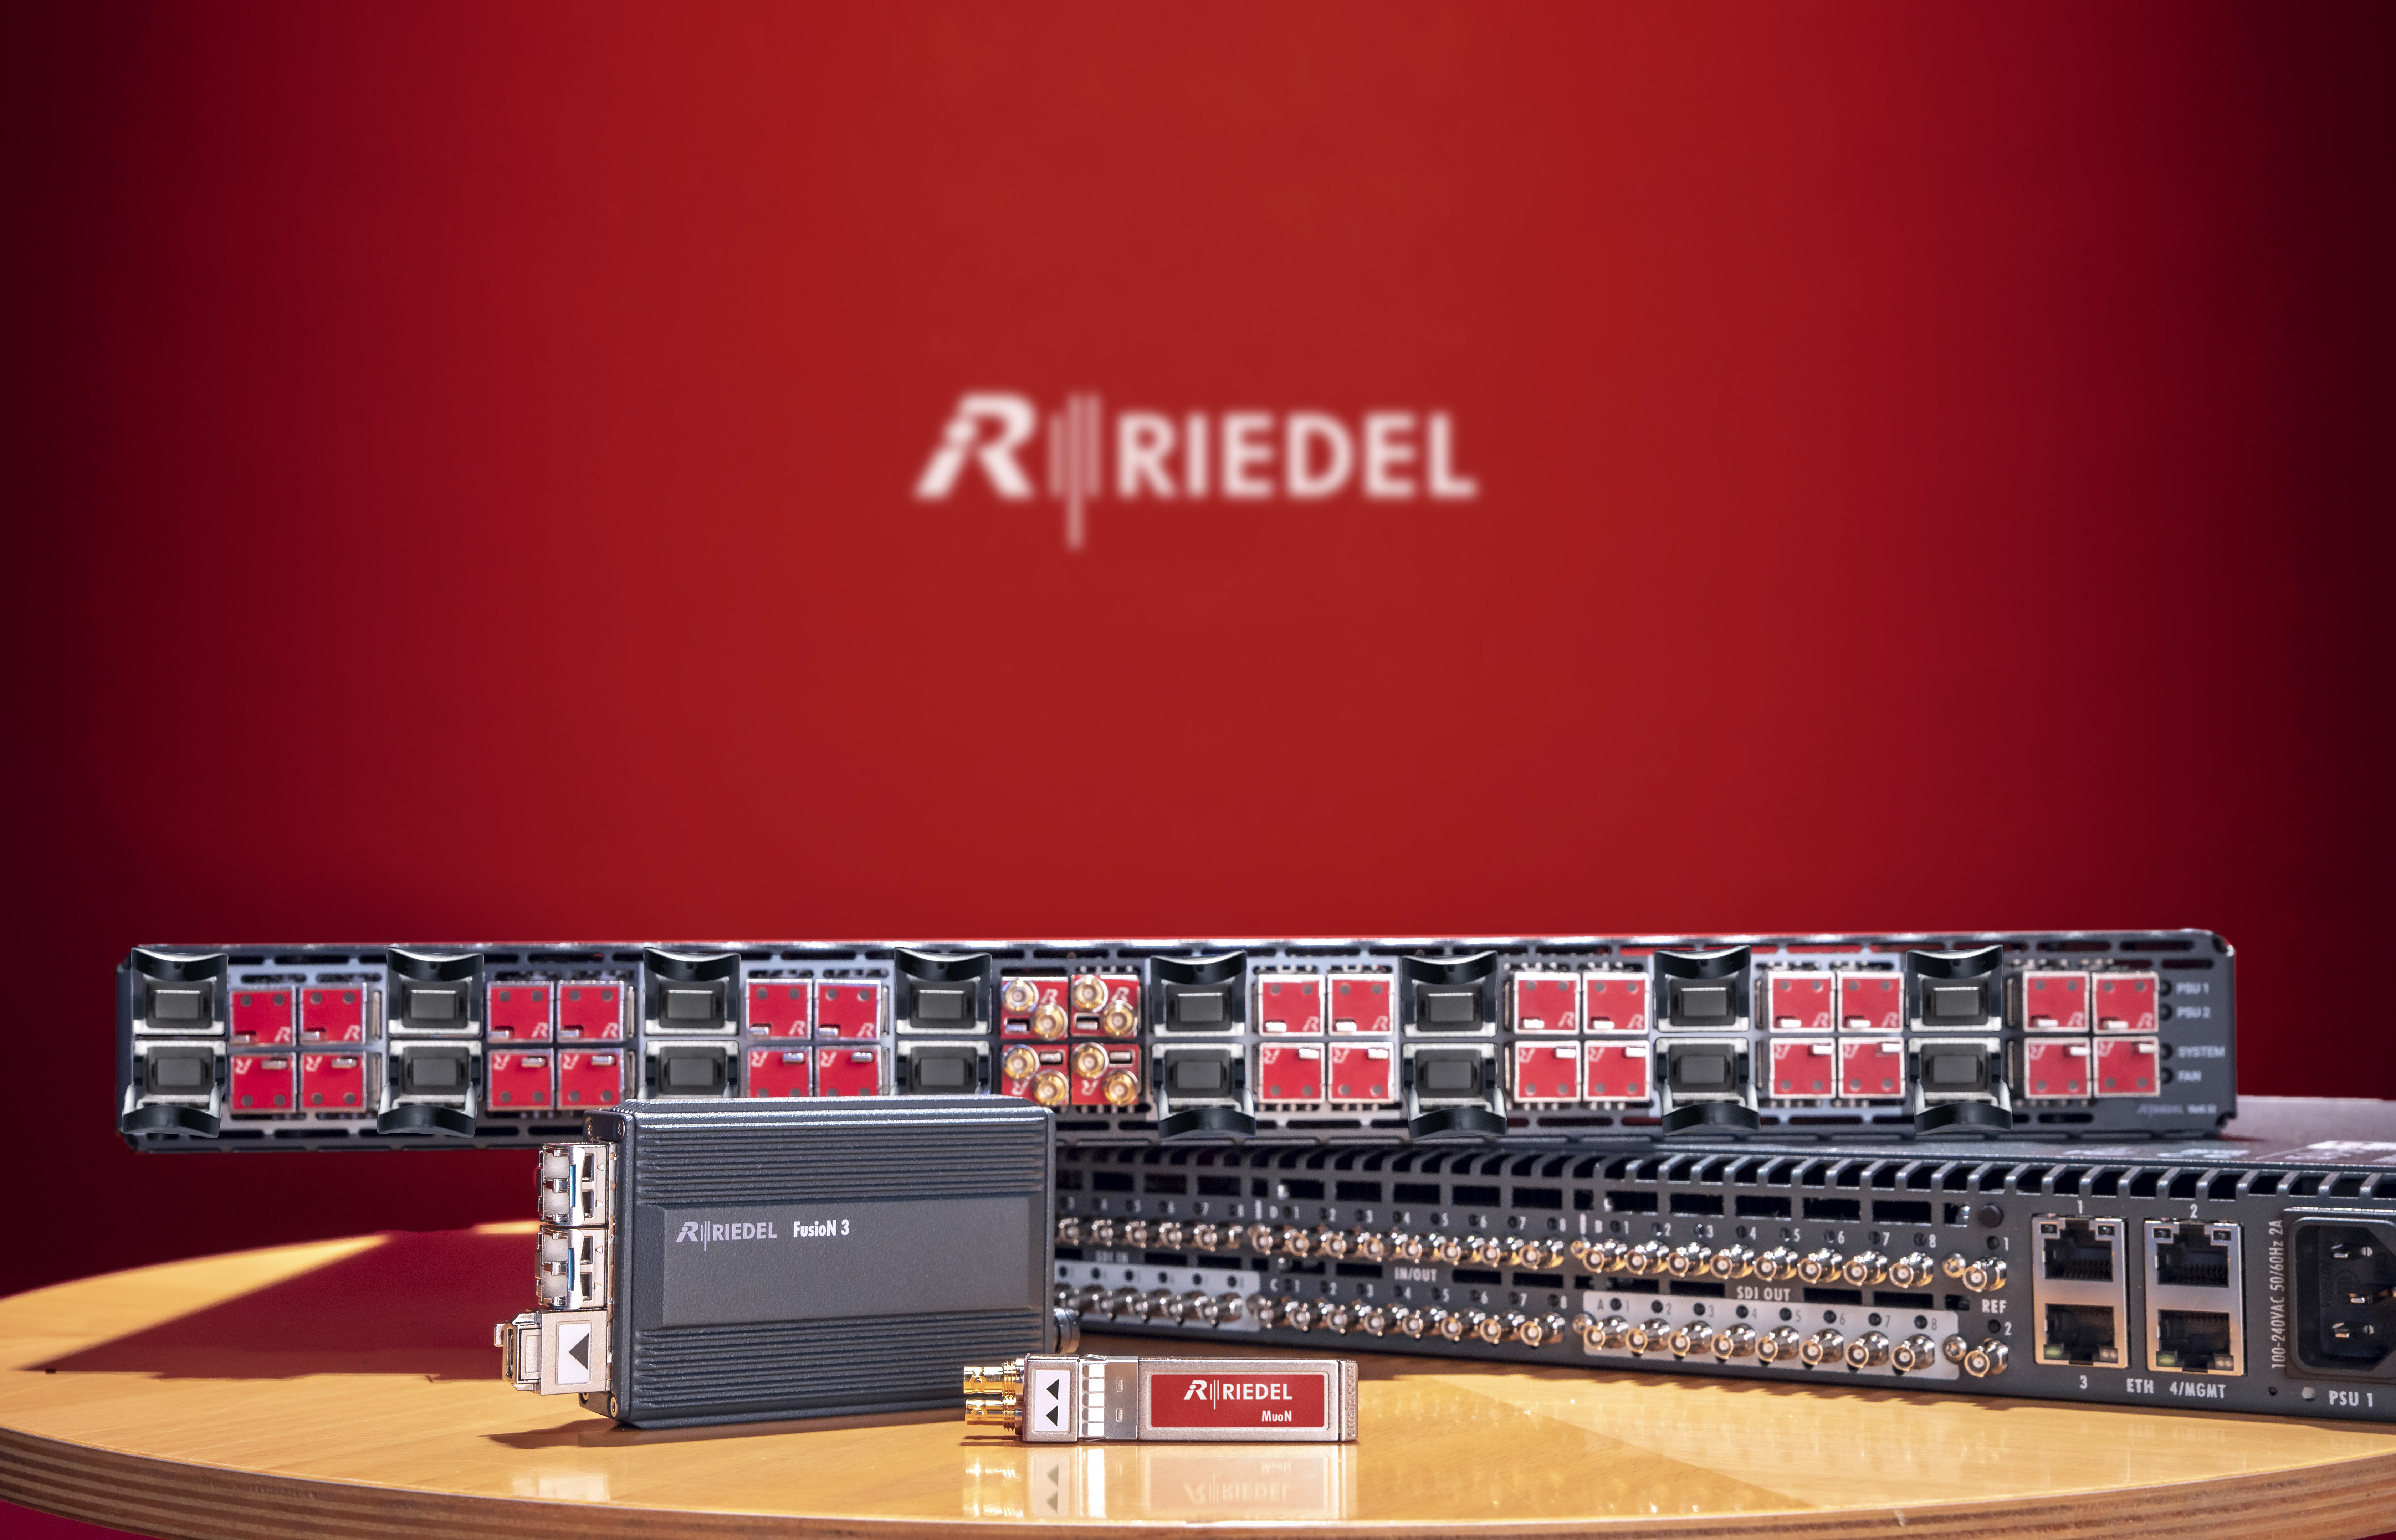 Riedel Mediornet